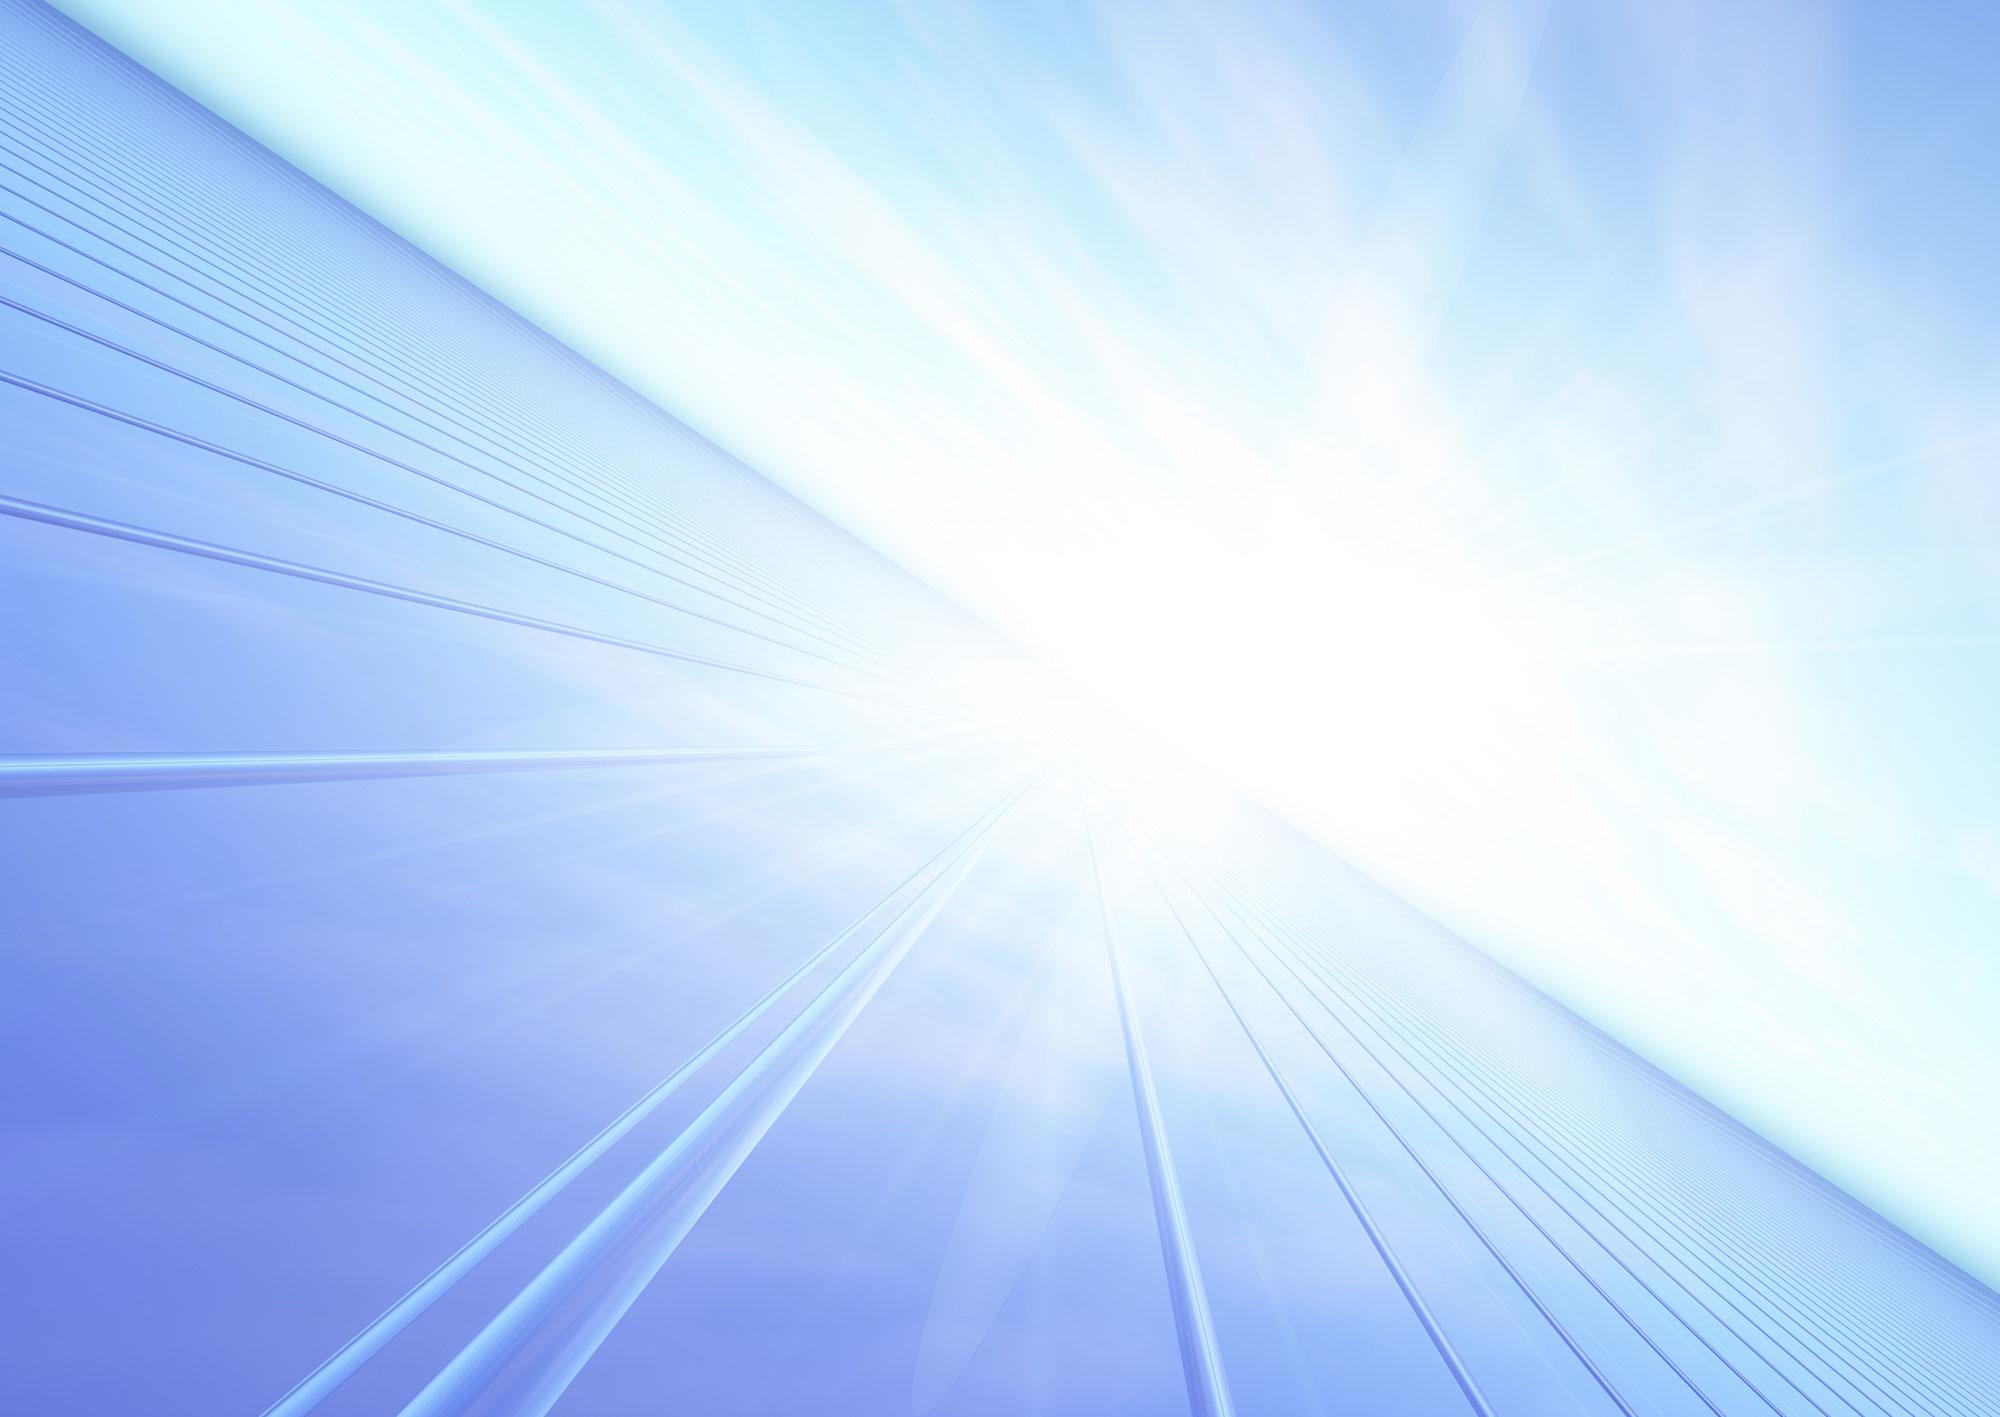 Background_LightBlue_Schmal